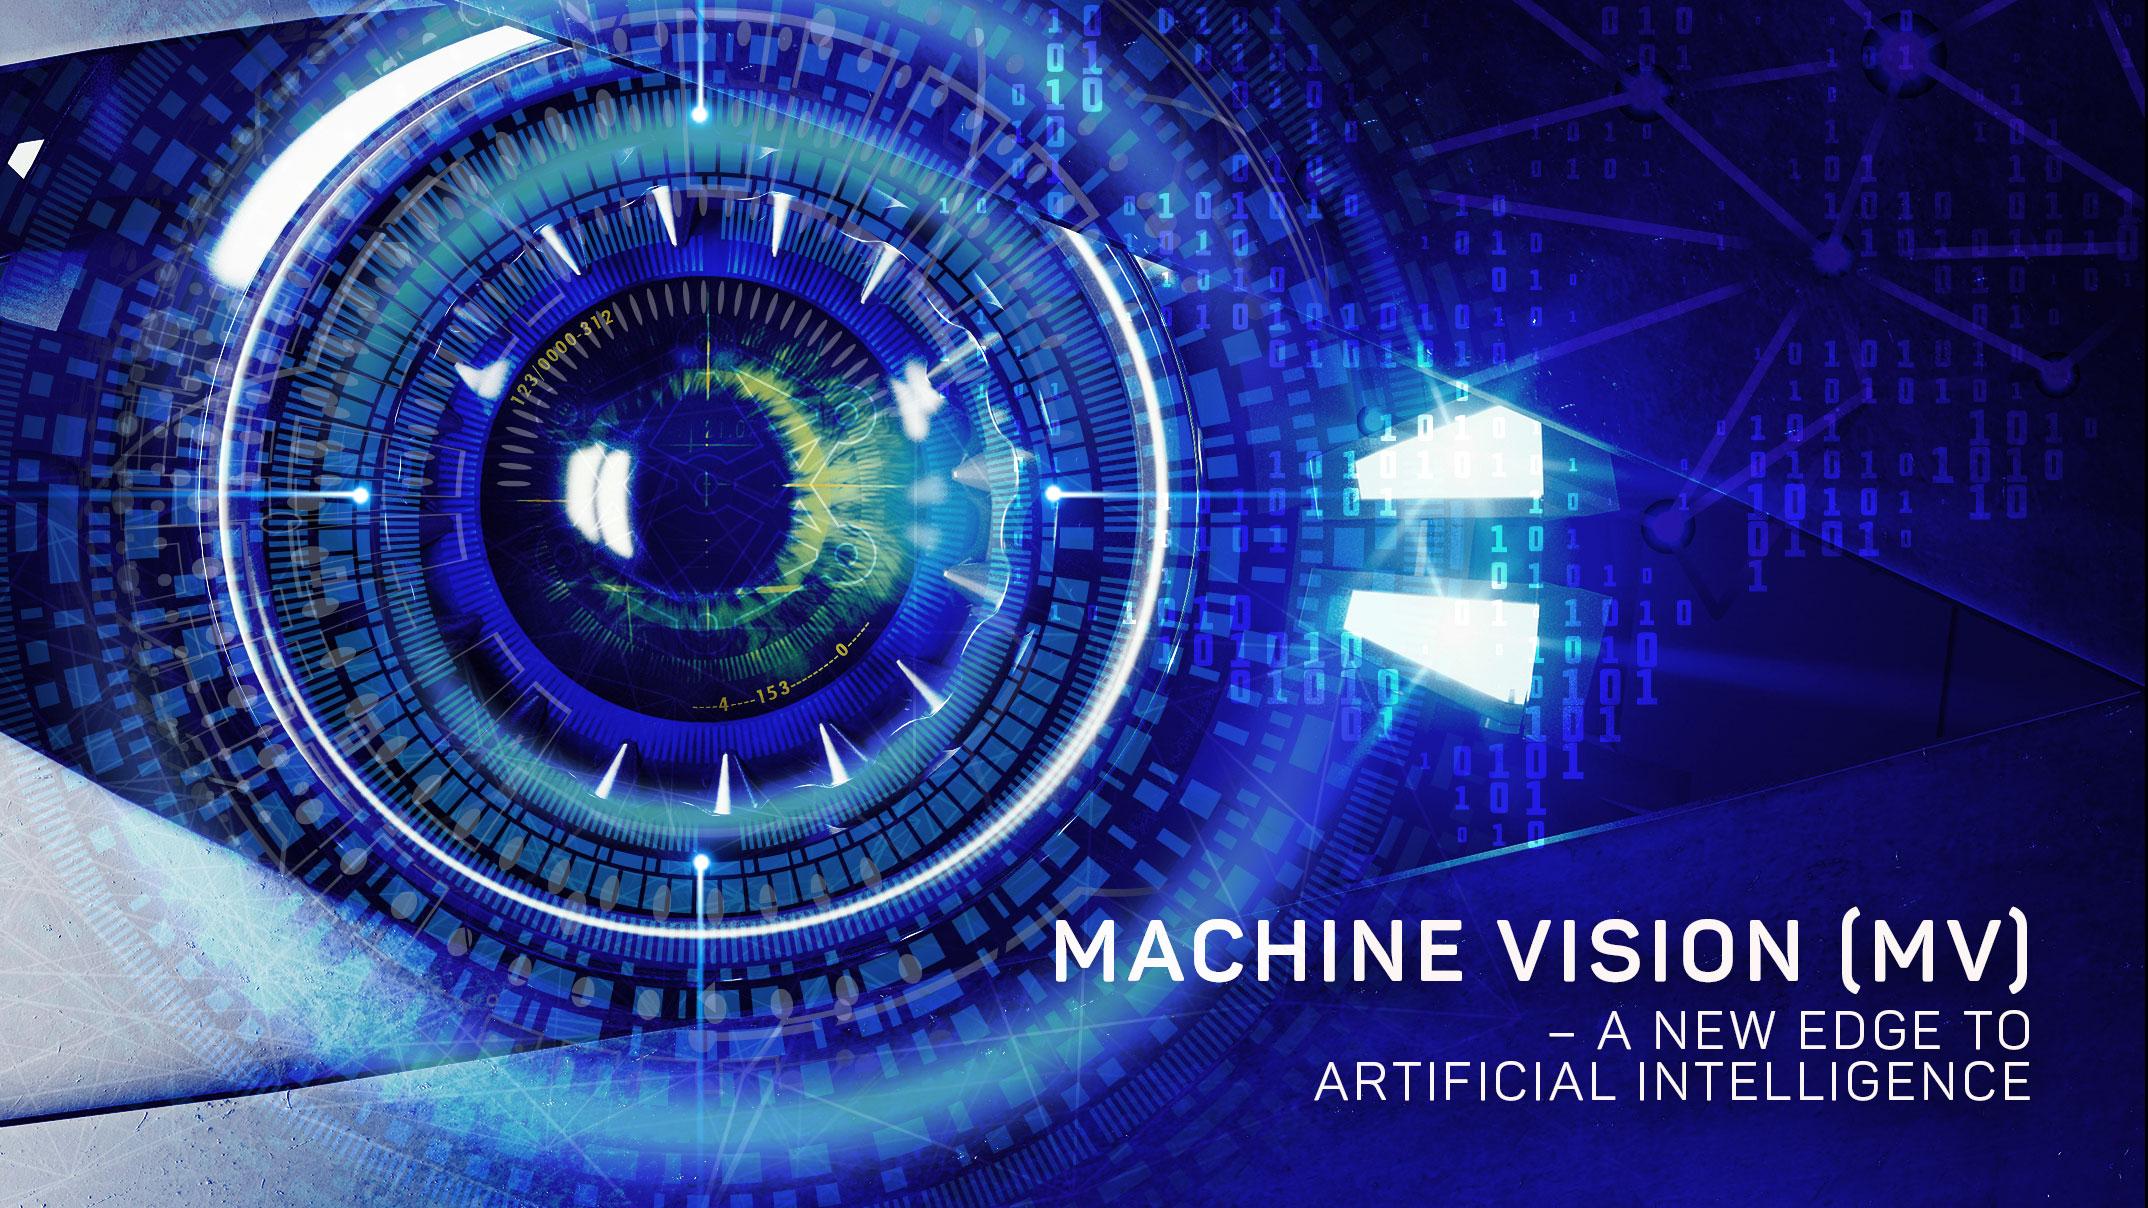 Kolektor Vision ekipa je del projekta Qu4lity